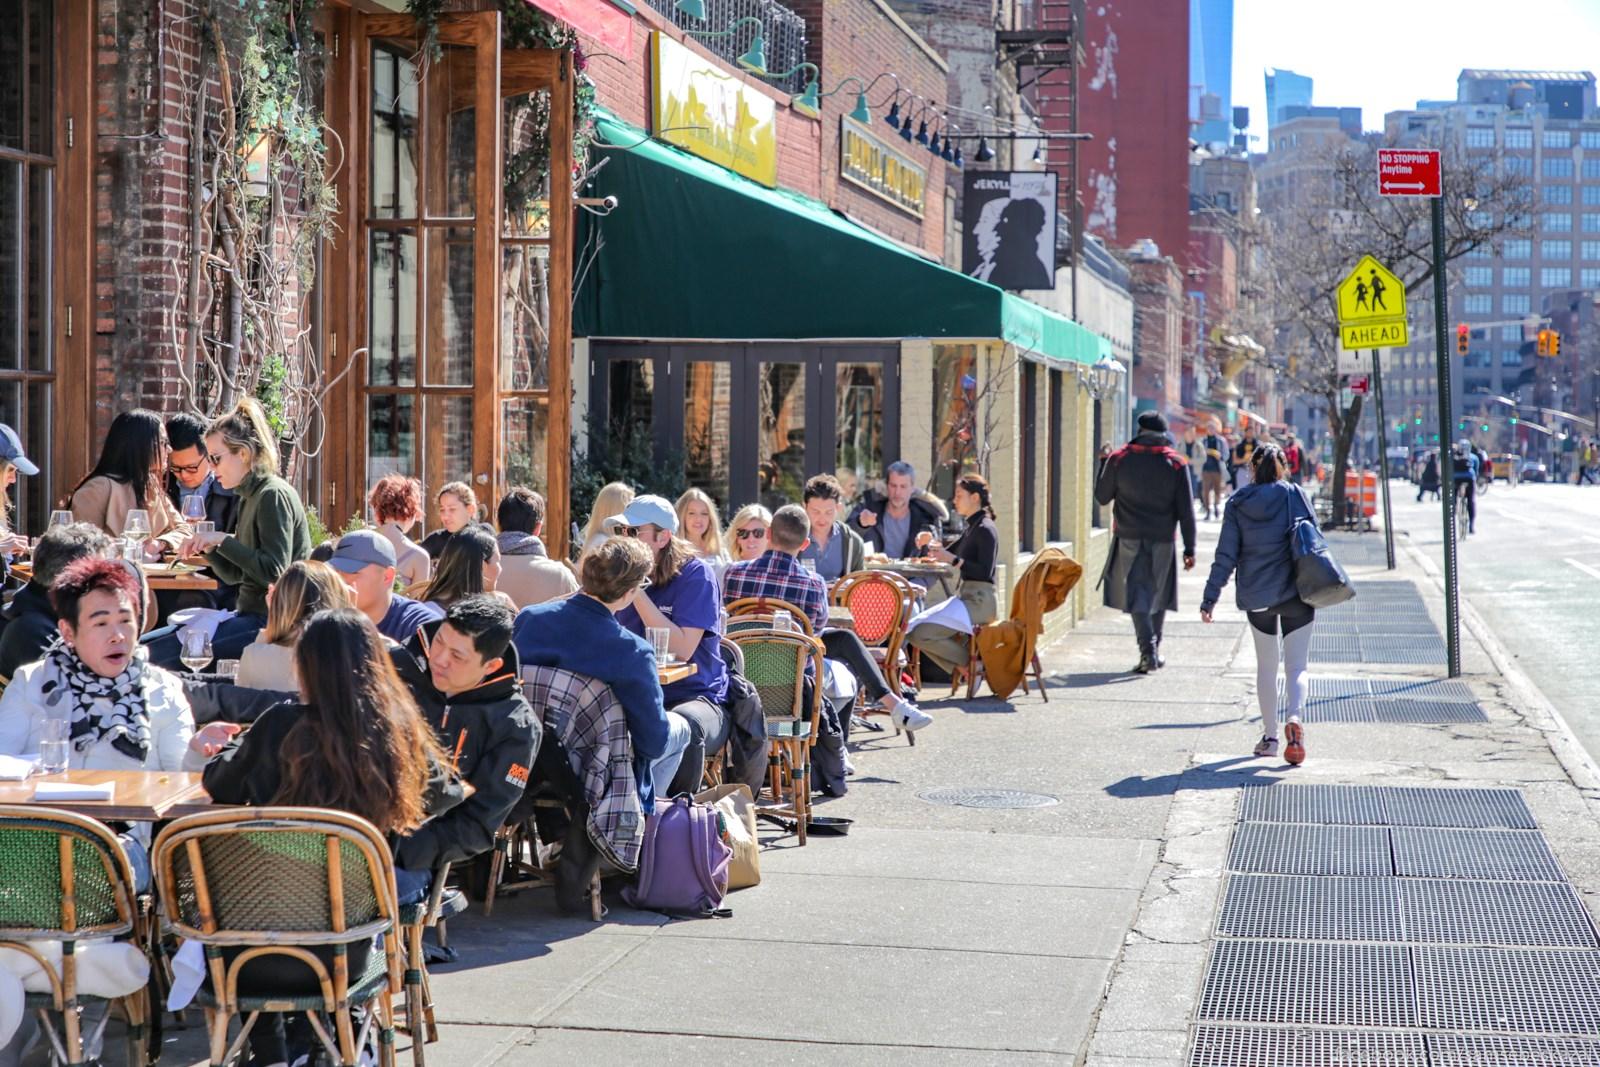 Kolicestvo ludej na ulicah i v kafe. Villidz.